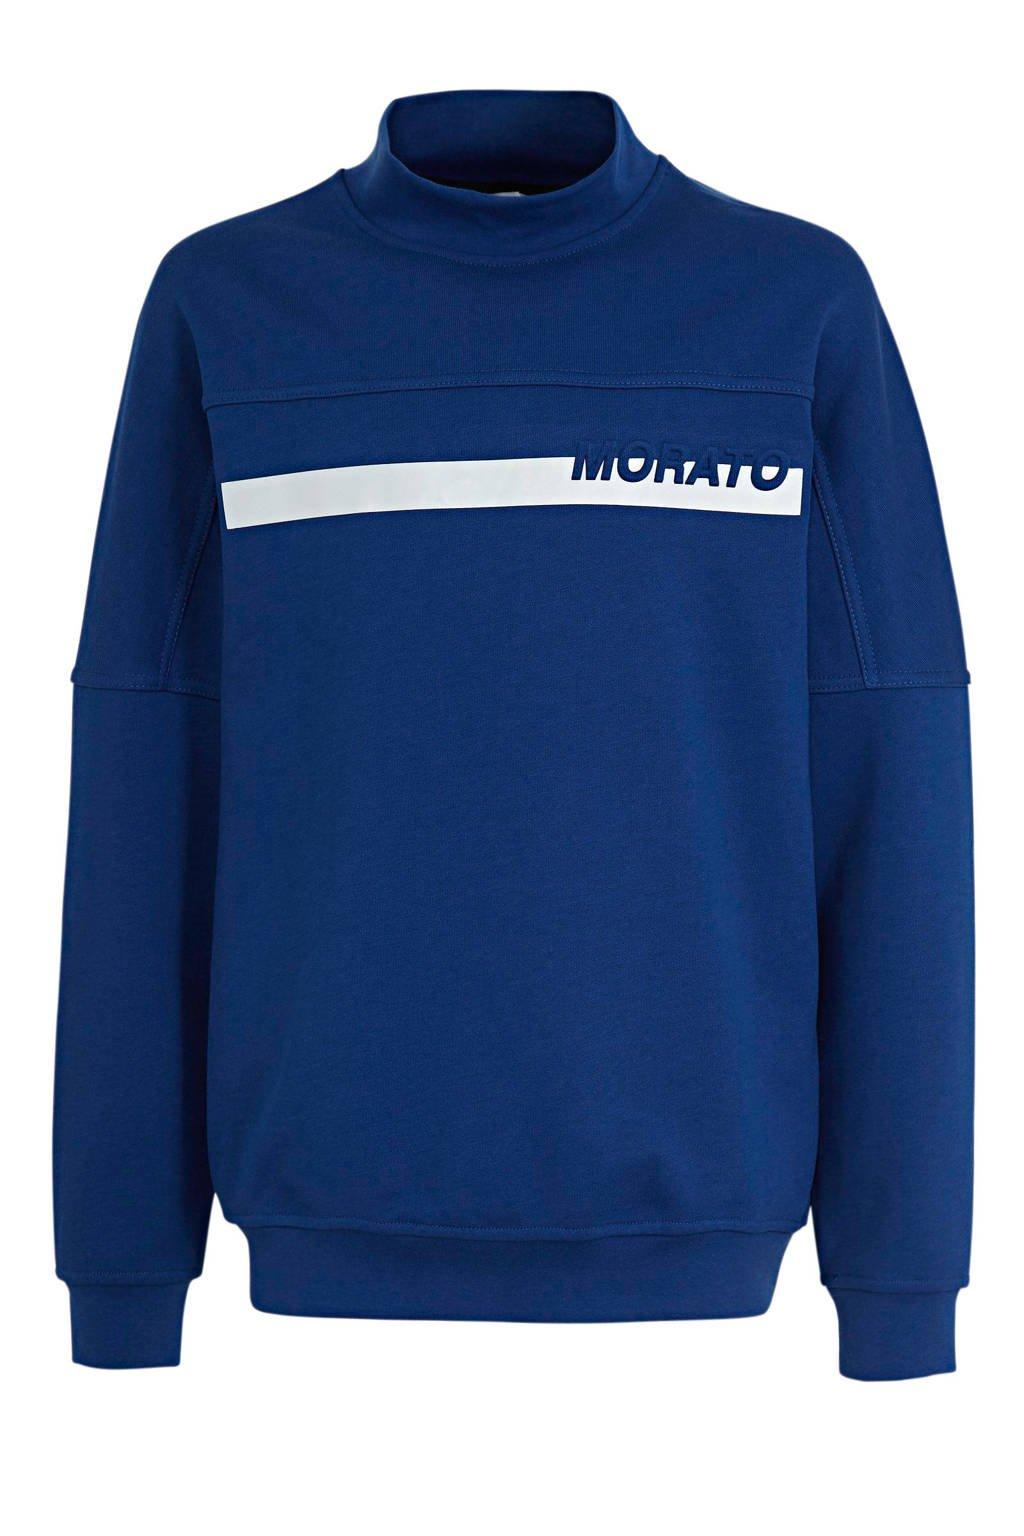 Antony Morato sweater met printopdruk kobaltblauw, Kobaltblauw